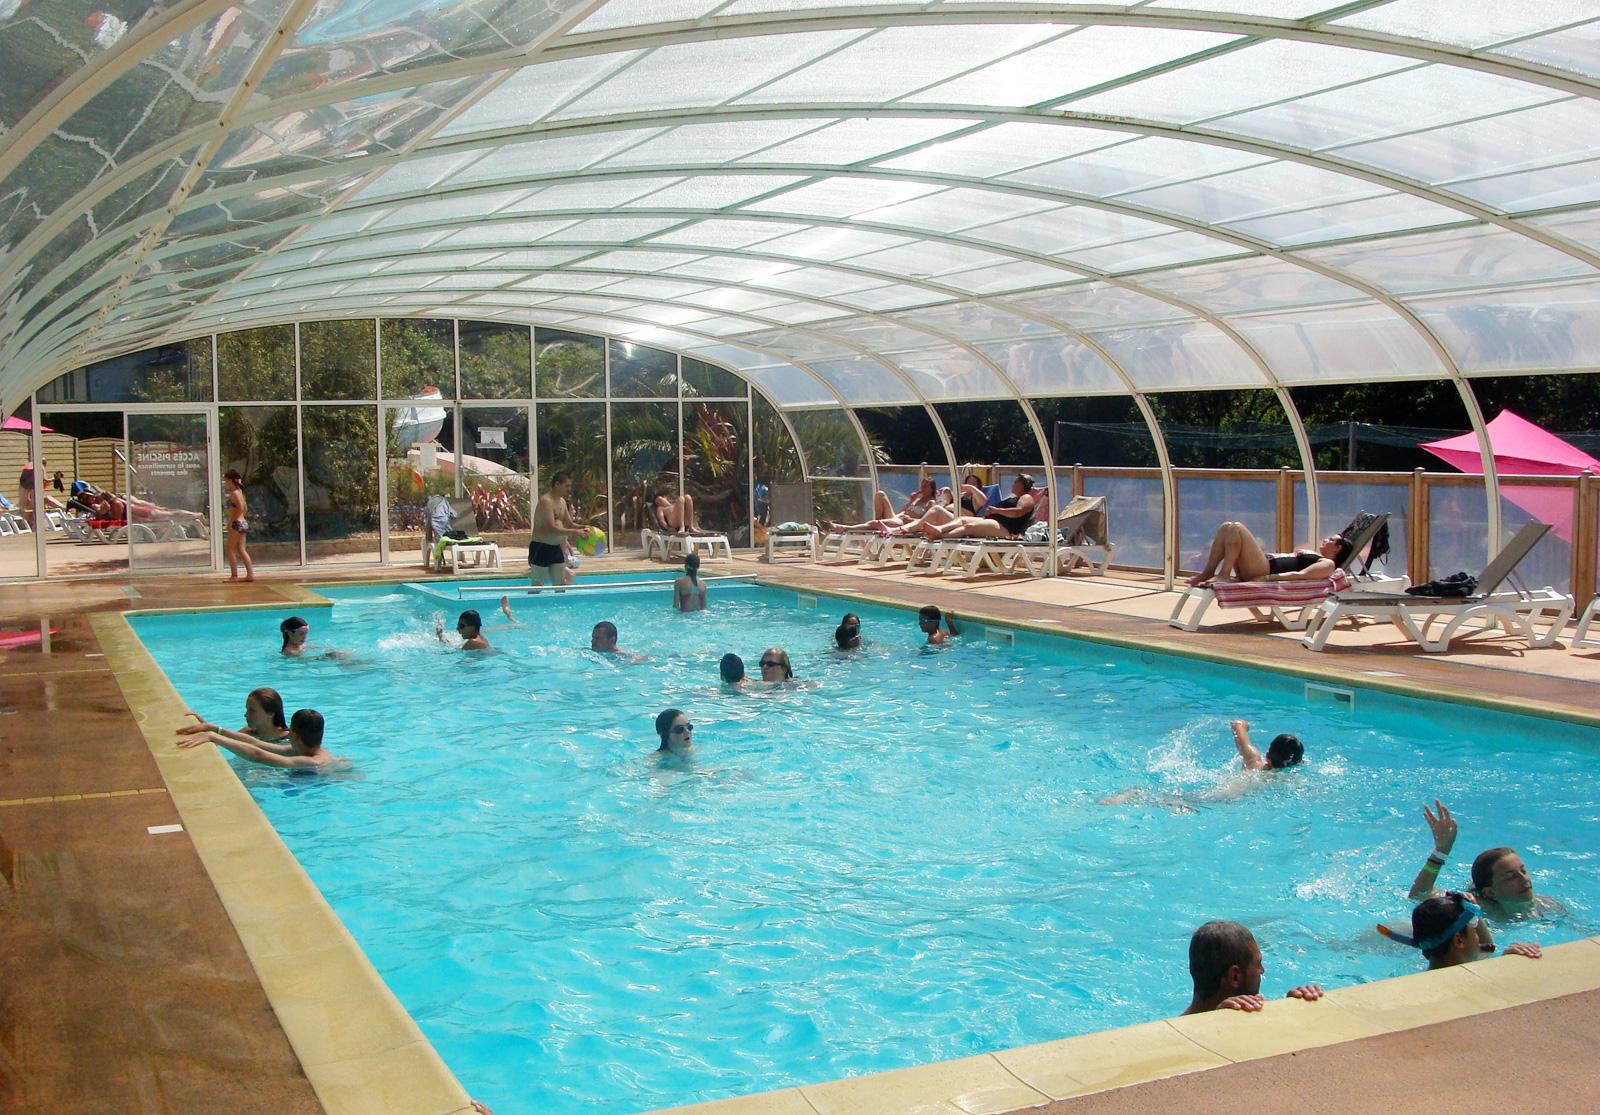 Camping Bretagne Avec Piscine Couverte Chauffée | Camping Le ... pour Piscine Bain De Bretagne